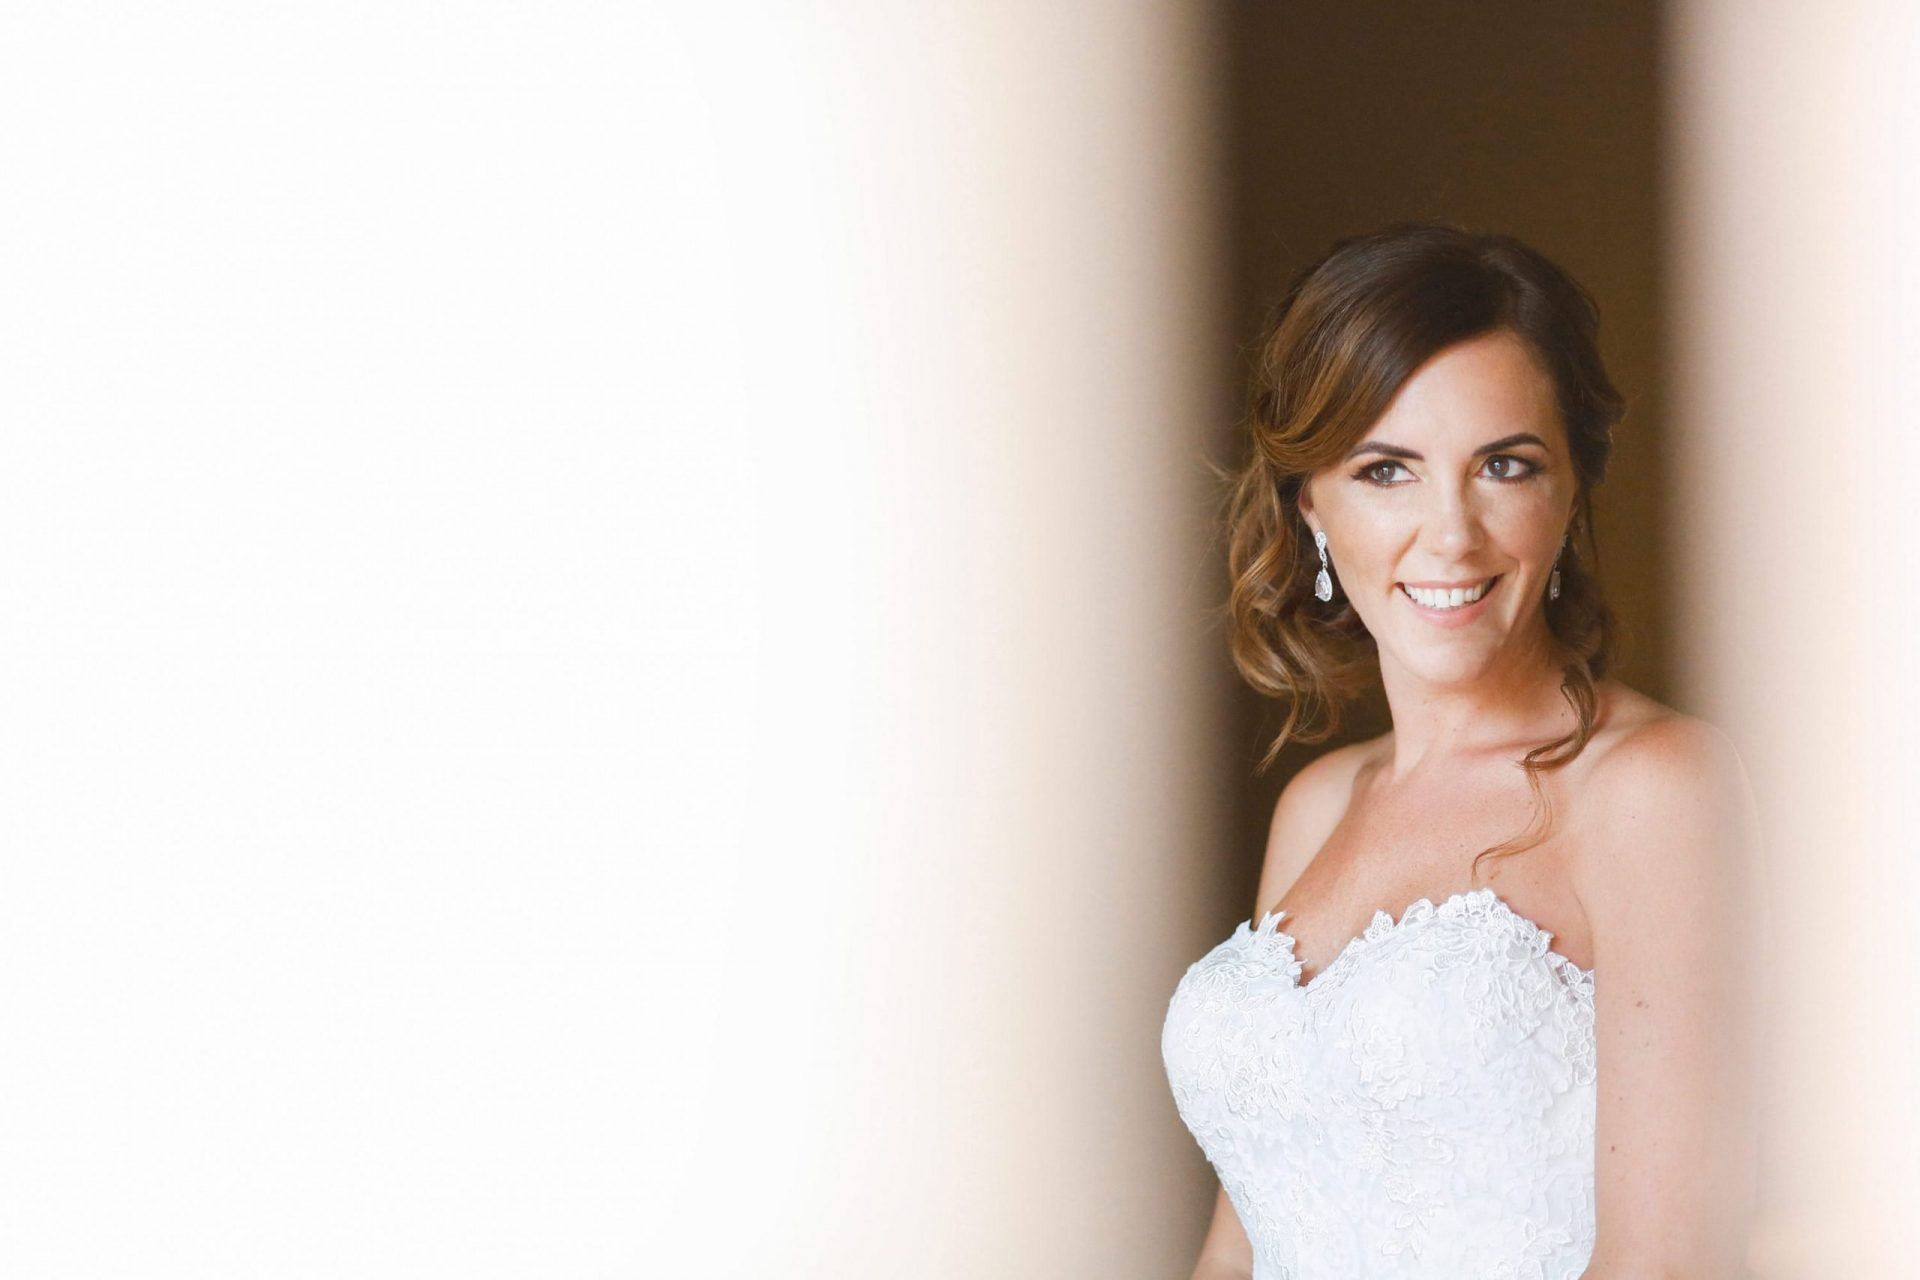 Enza e Samuele, the bride